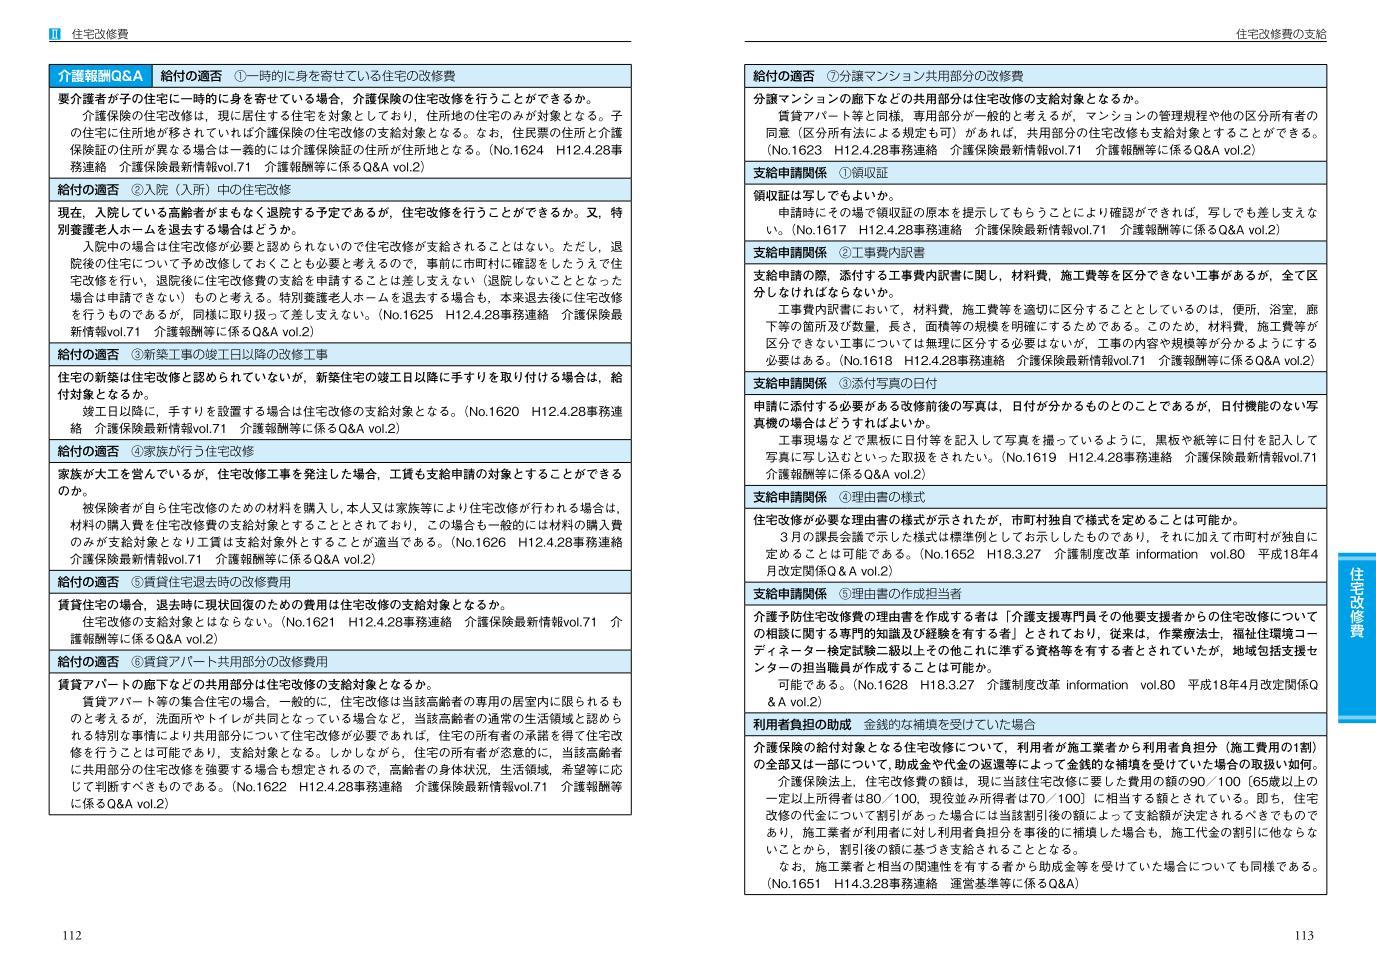 介護保険 福祉用具・住宅改修ガイド 令和3年4月版